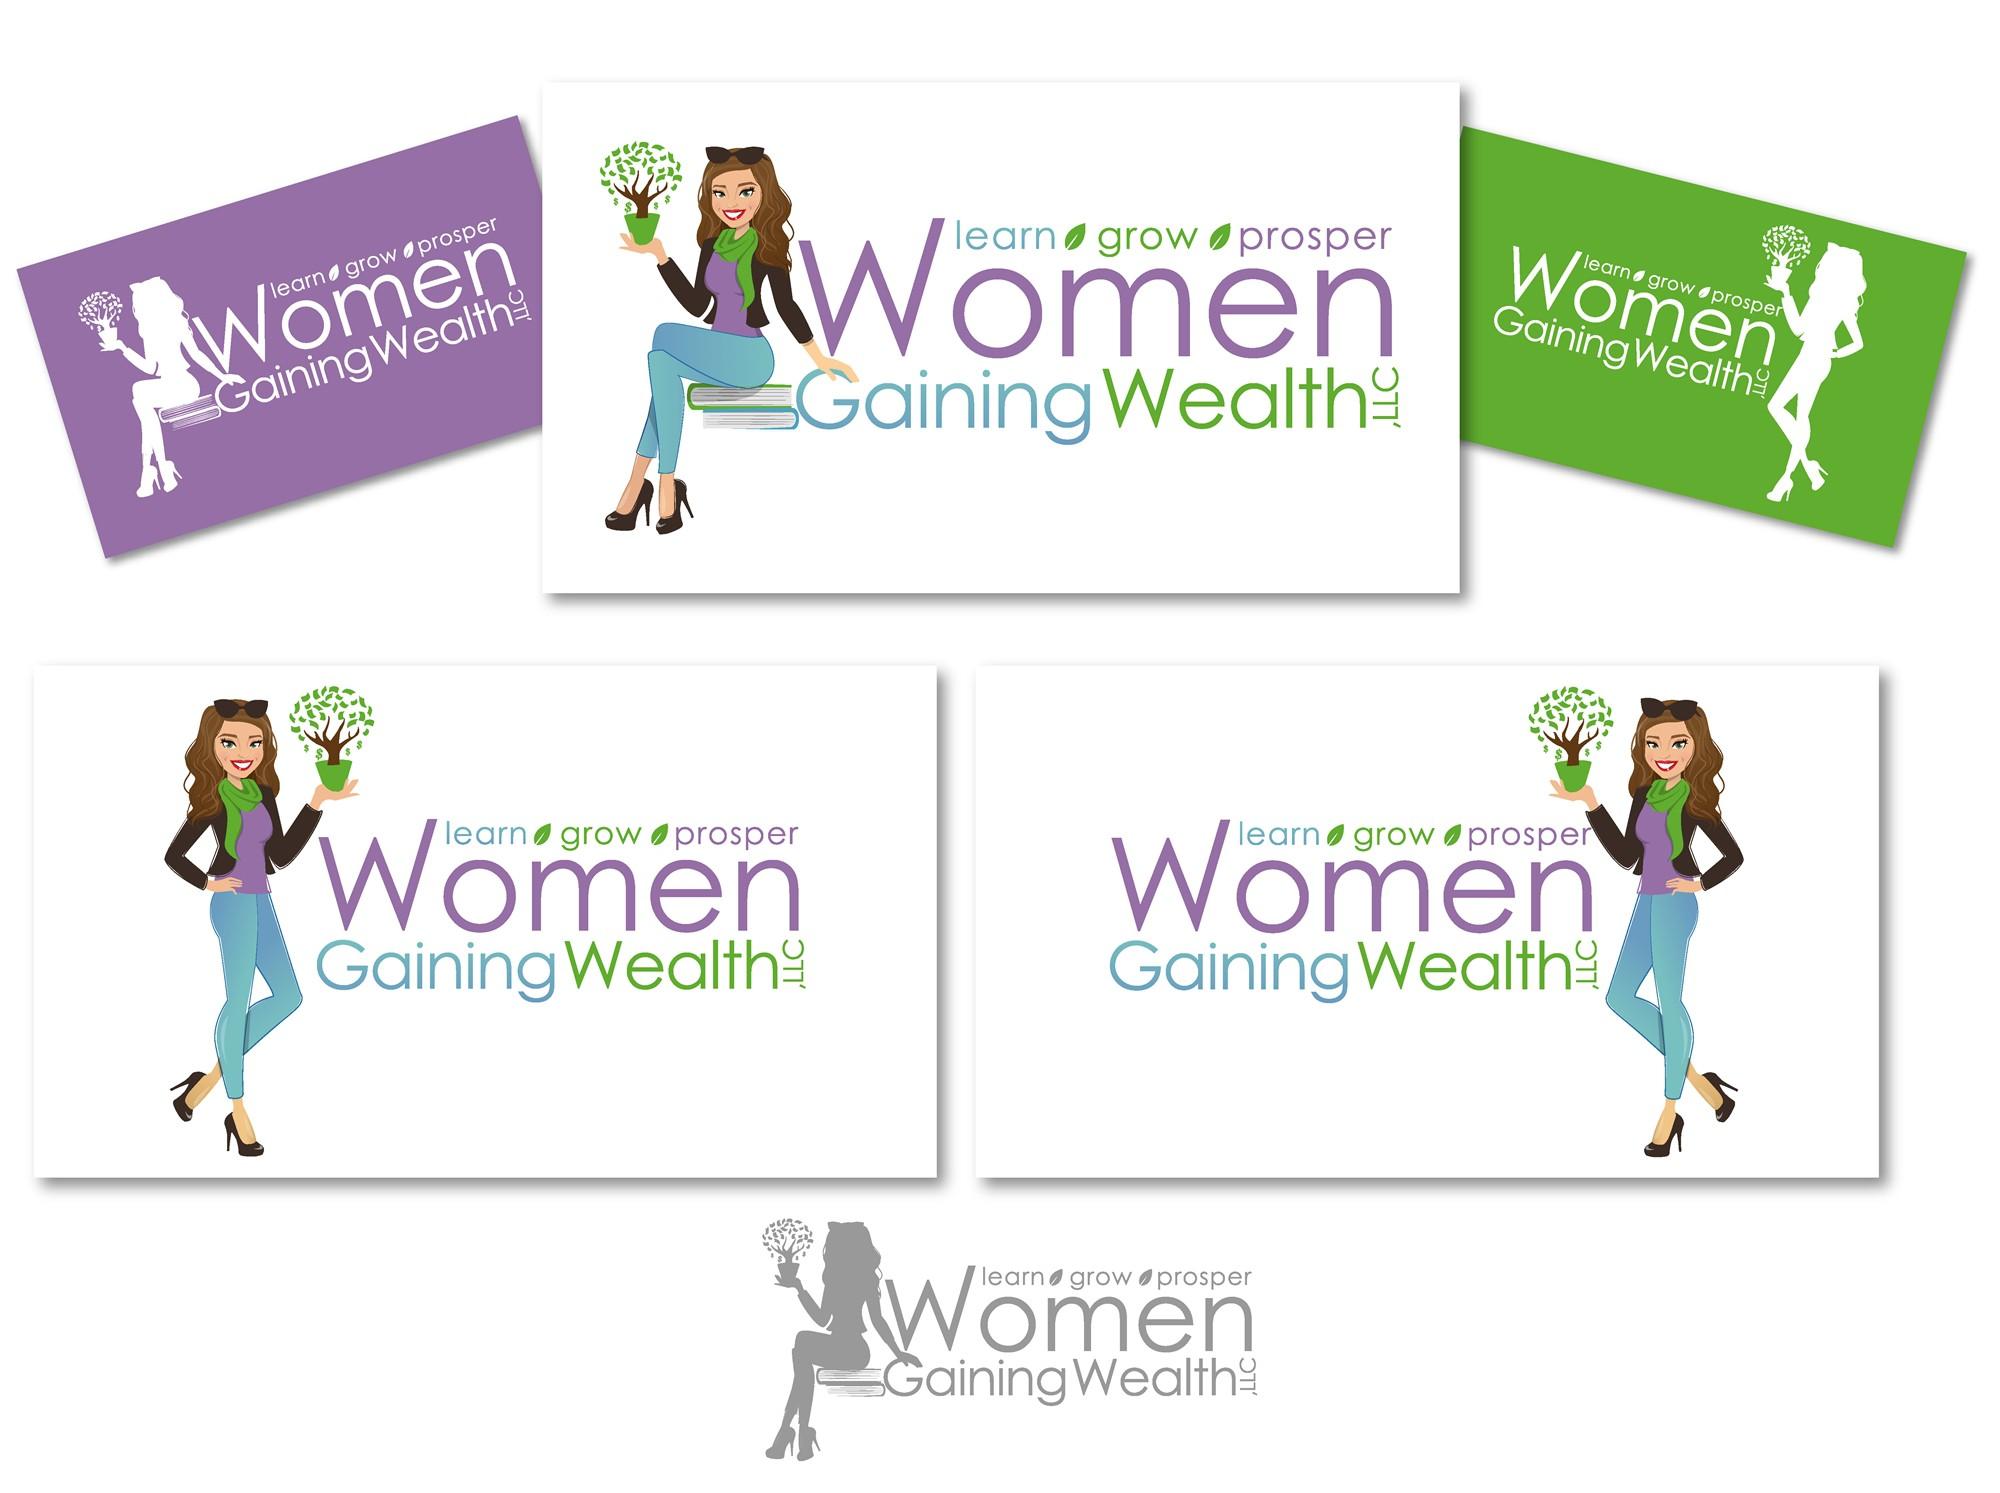 Help us Change Lives!!  Fun Company Teaching Money Skills to Women needs a powerful logo/brand.